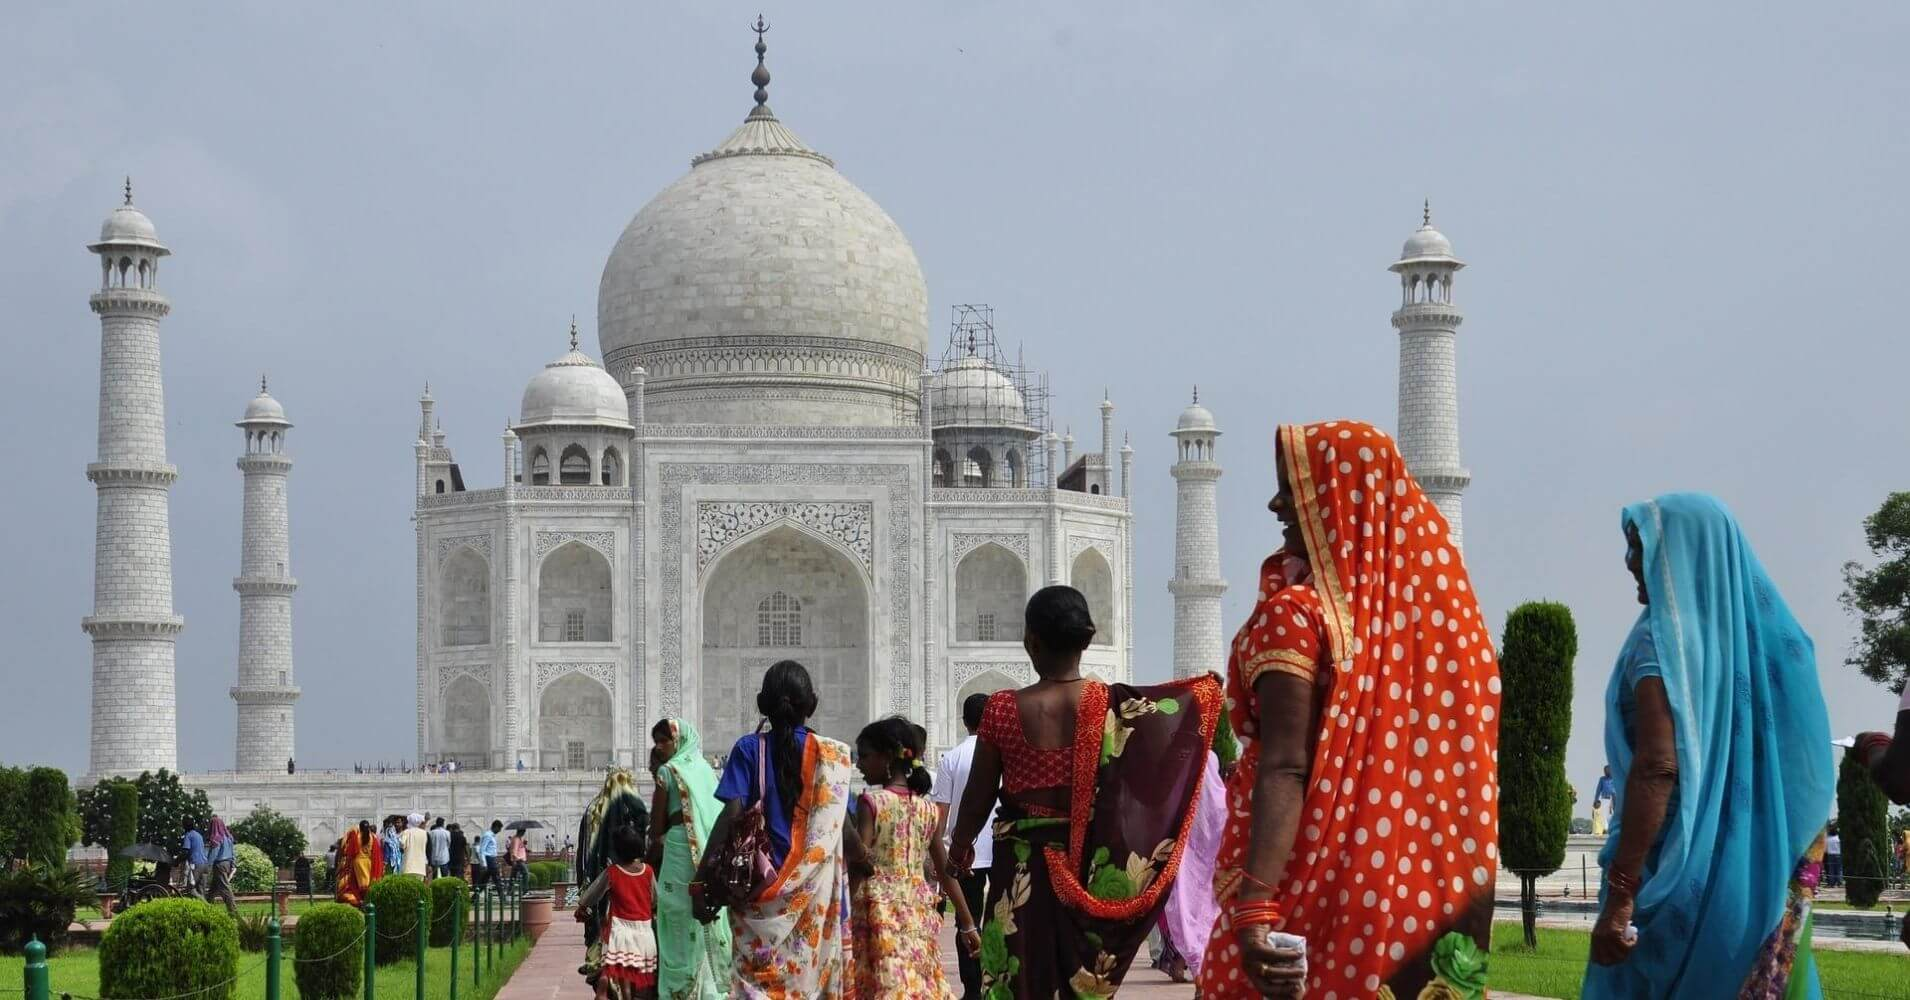 Taj Mahal. Agra.